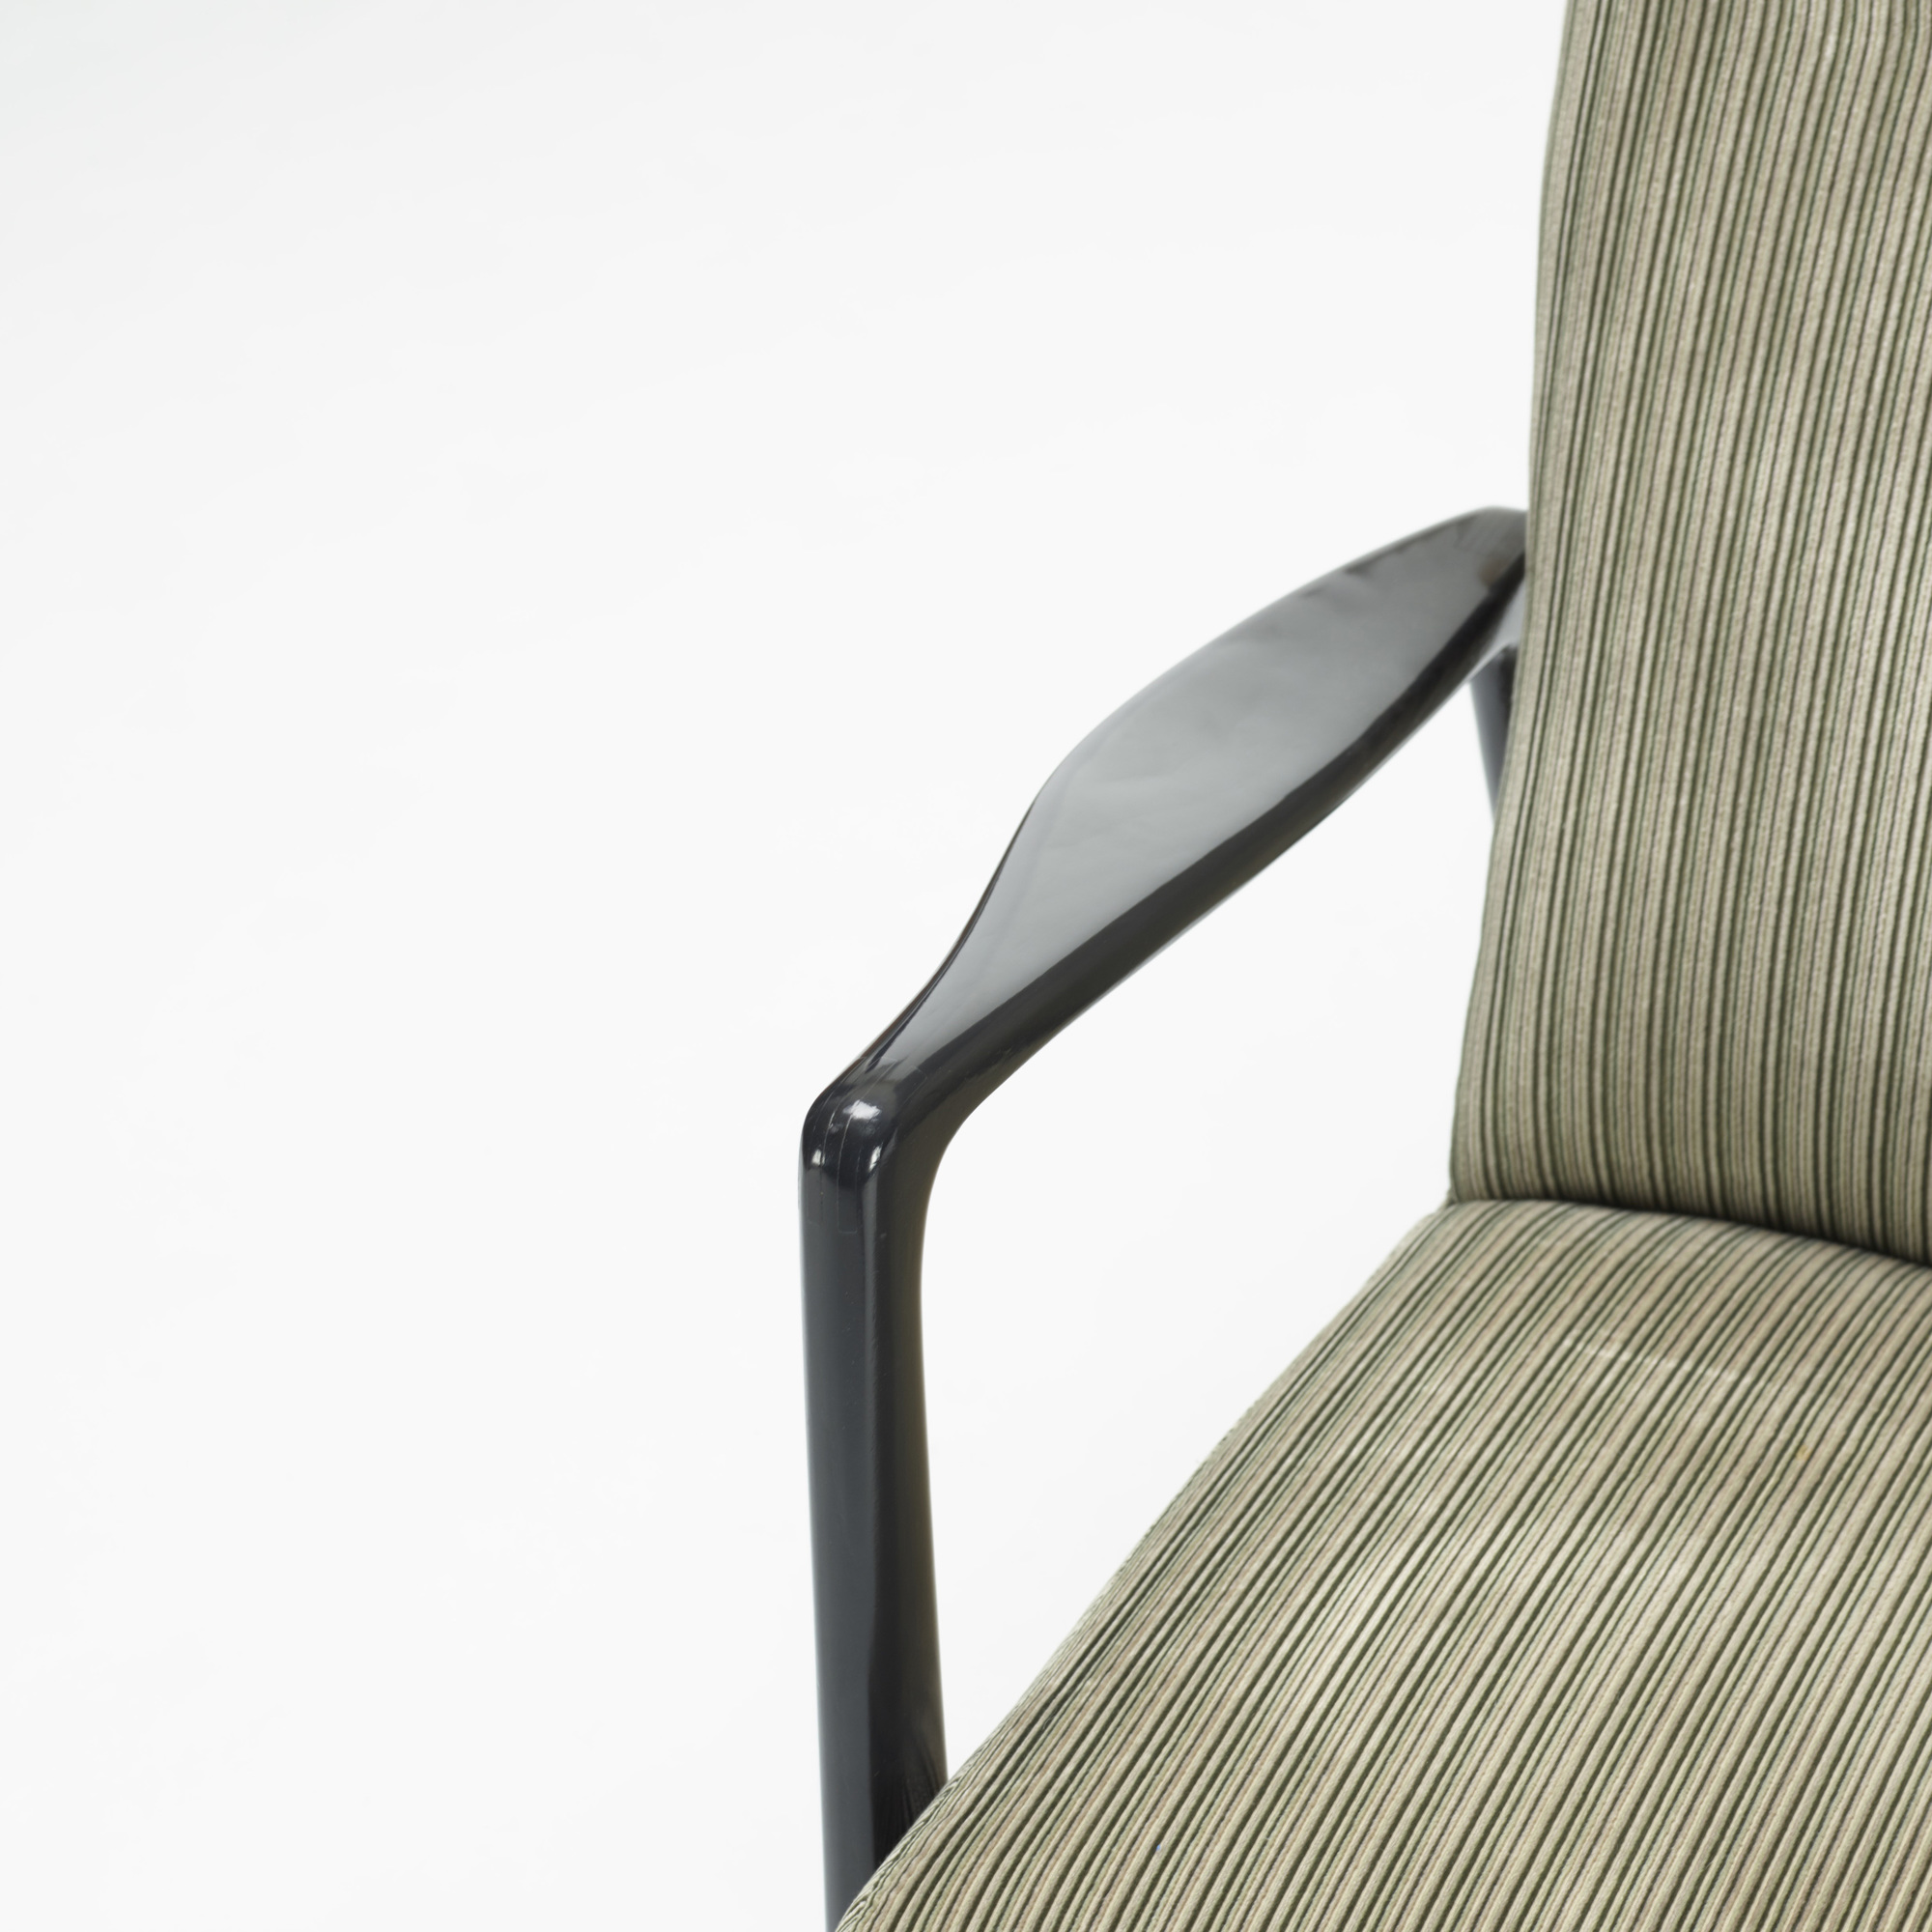 248: Gio Ponti / armchair, model 829 (3 of 3)